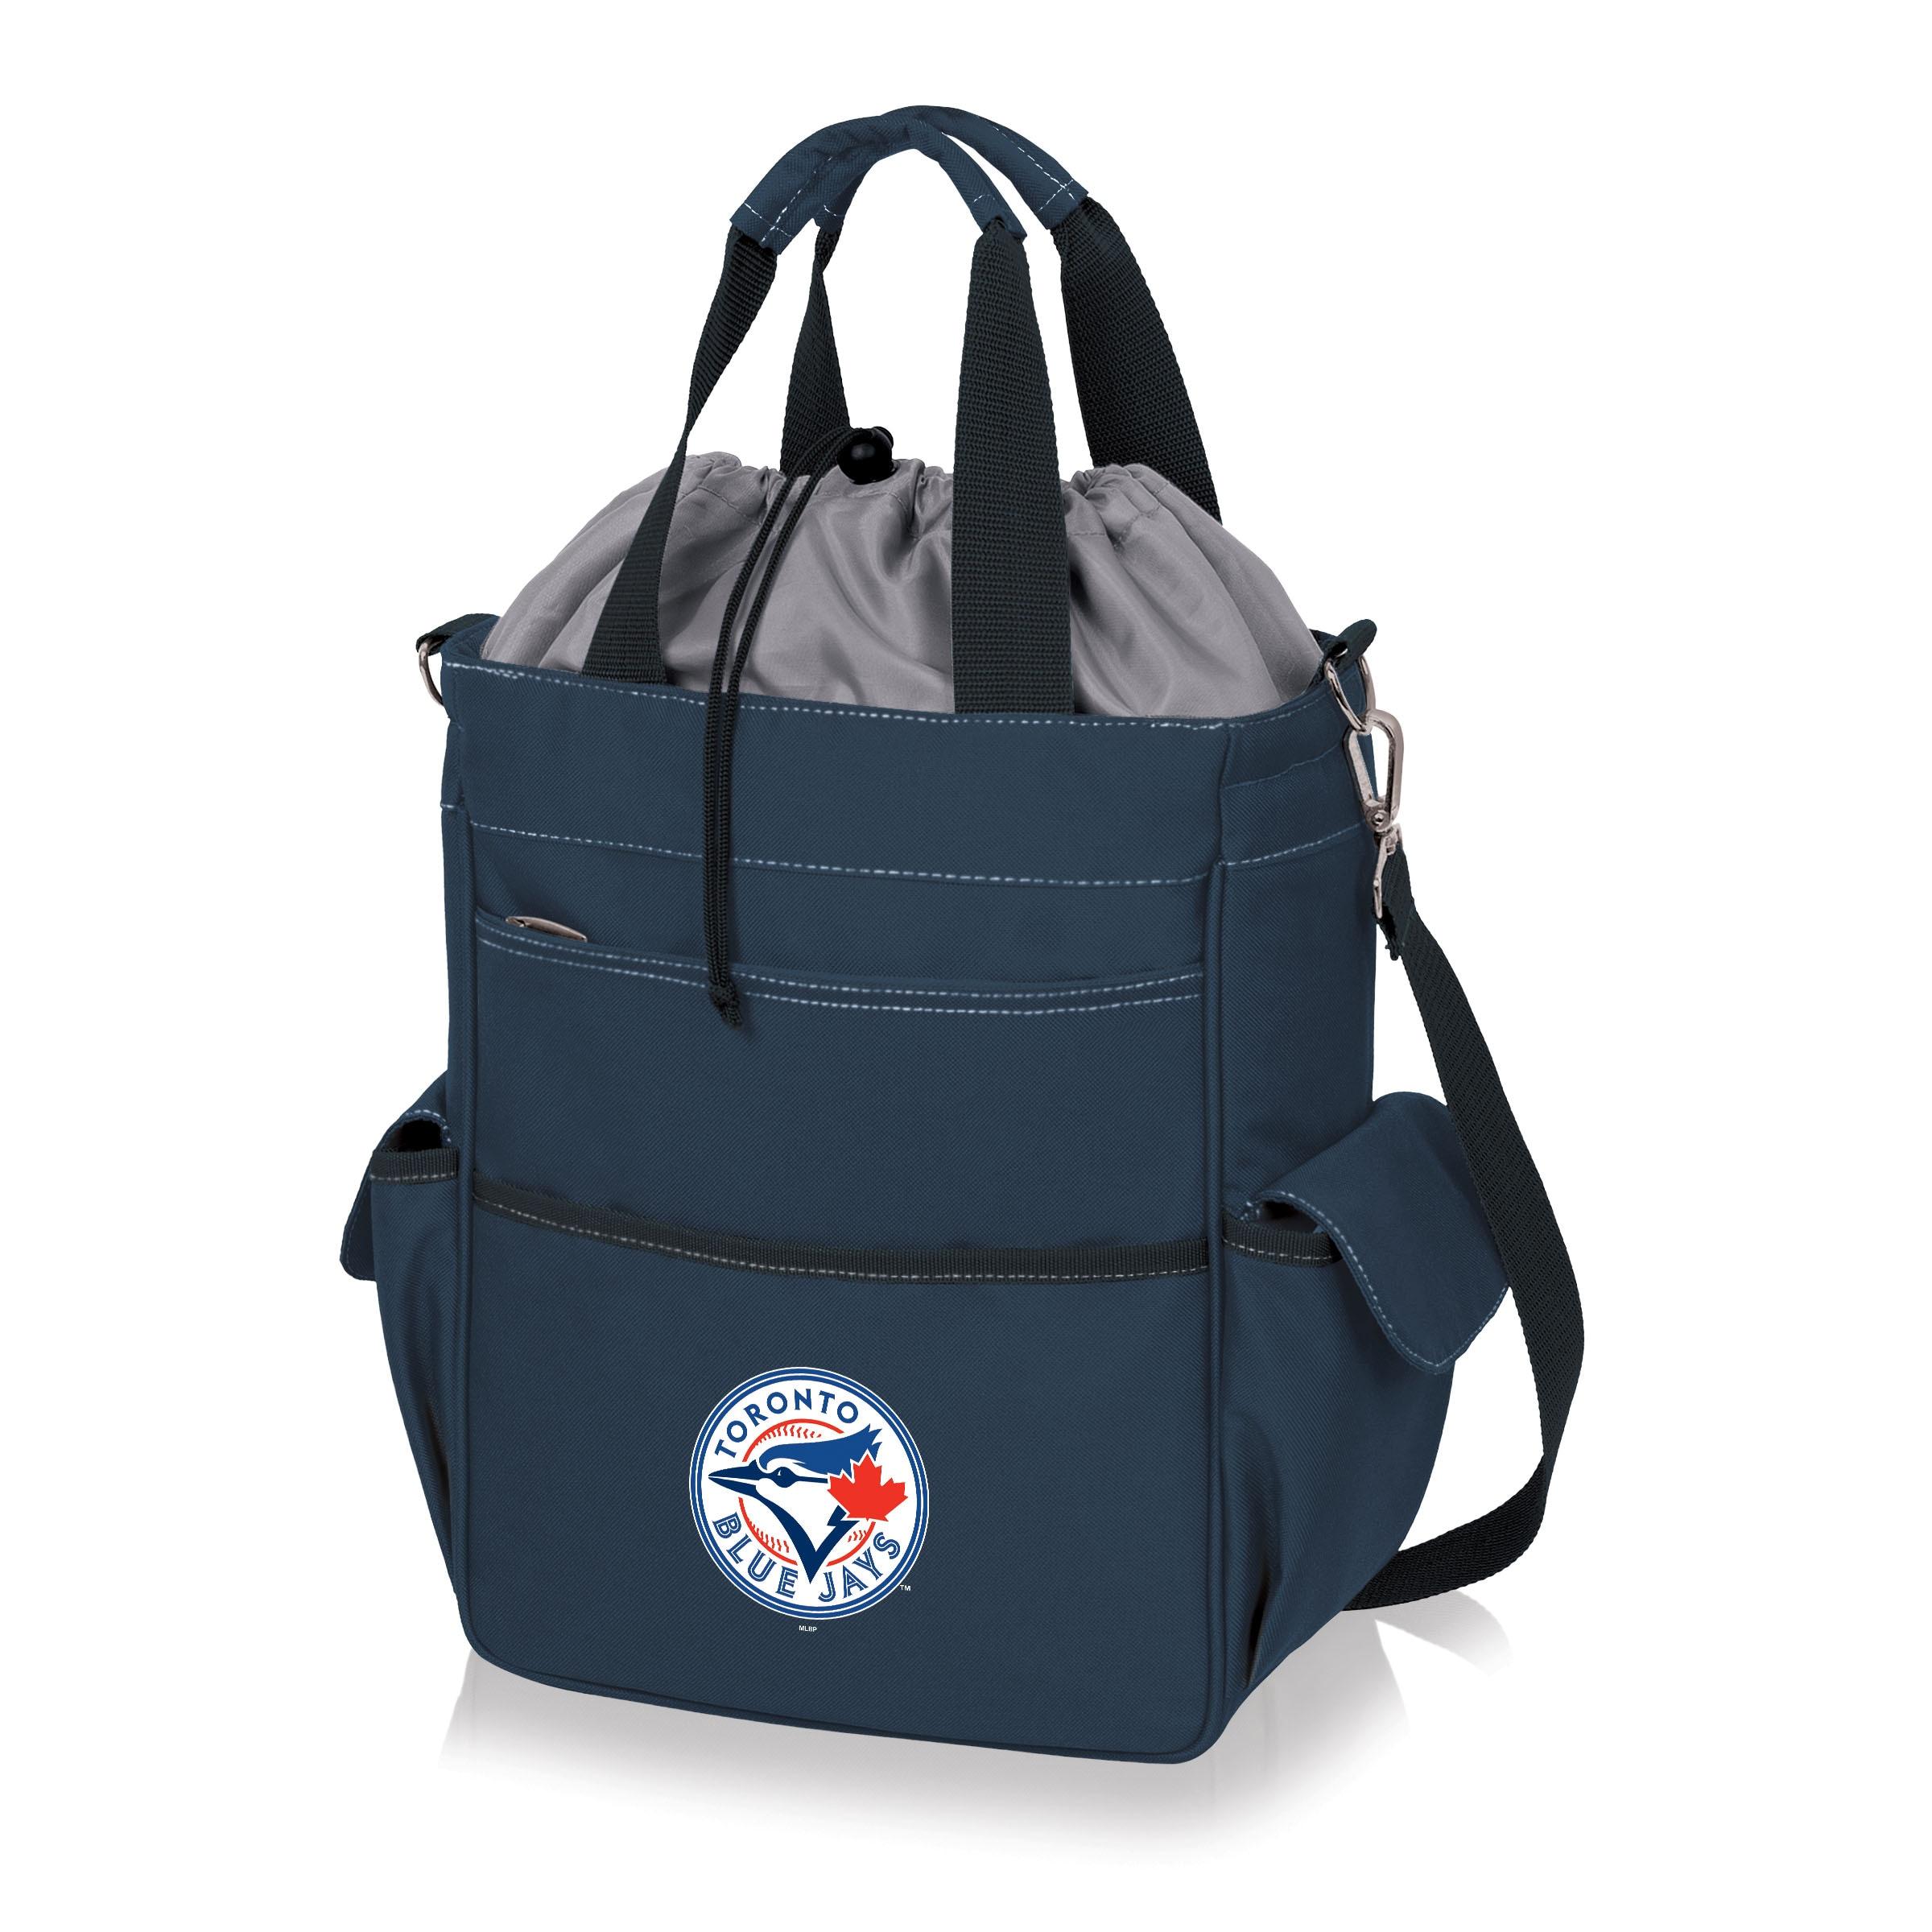 Toronto Blue Jays Activo Cooler Tote - Navy